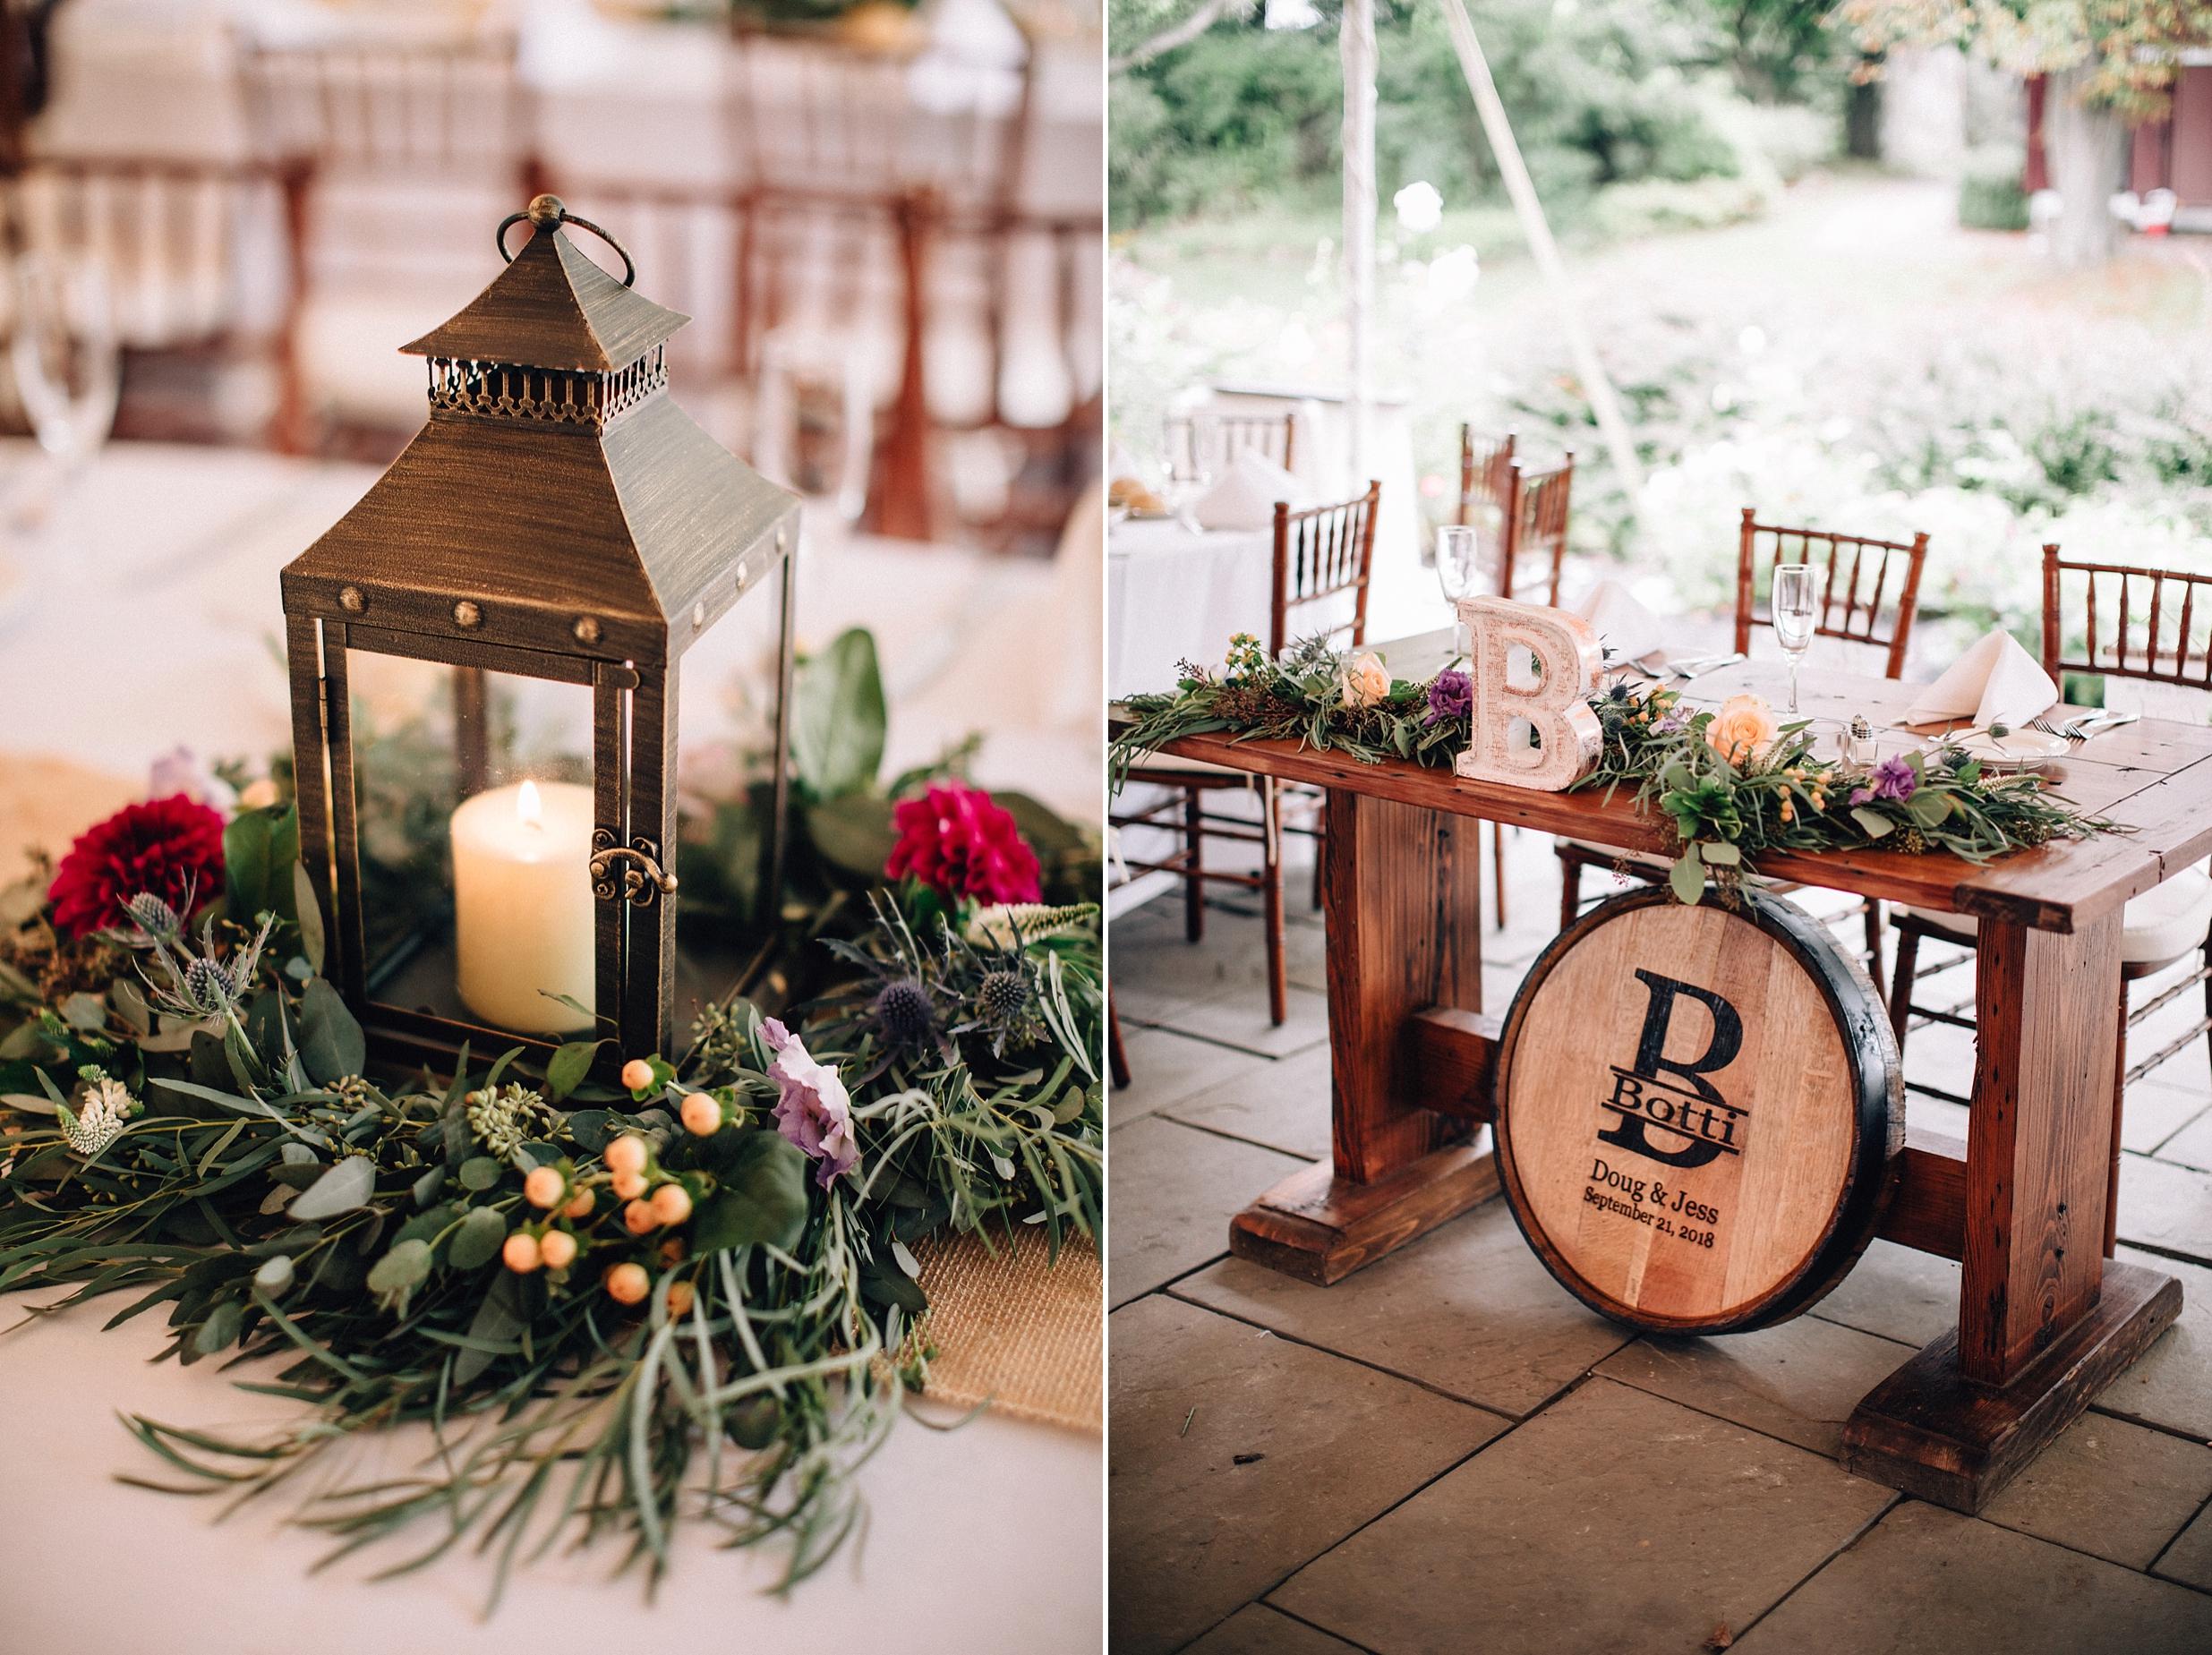 crossed-keys-outdoor-ceremony-camp-wedding-photo_0051.jpg